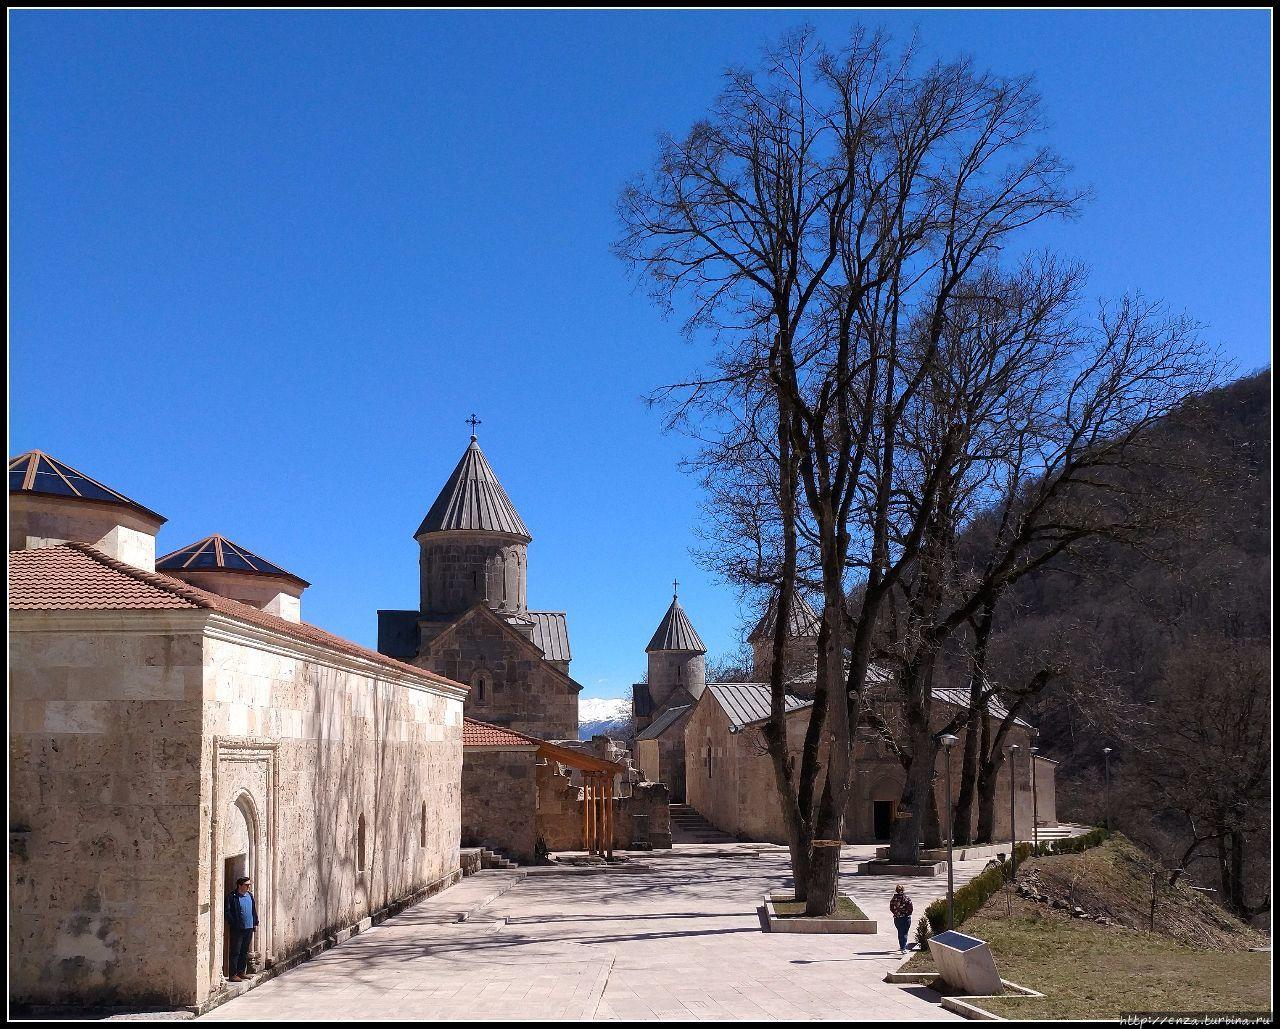 Армения. День 5. Агарцин. Там, где Бог хранит свою палитру